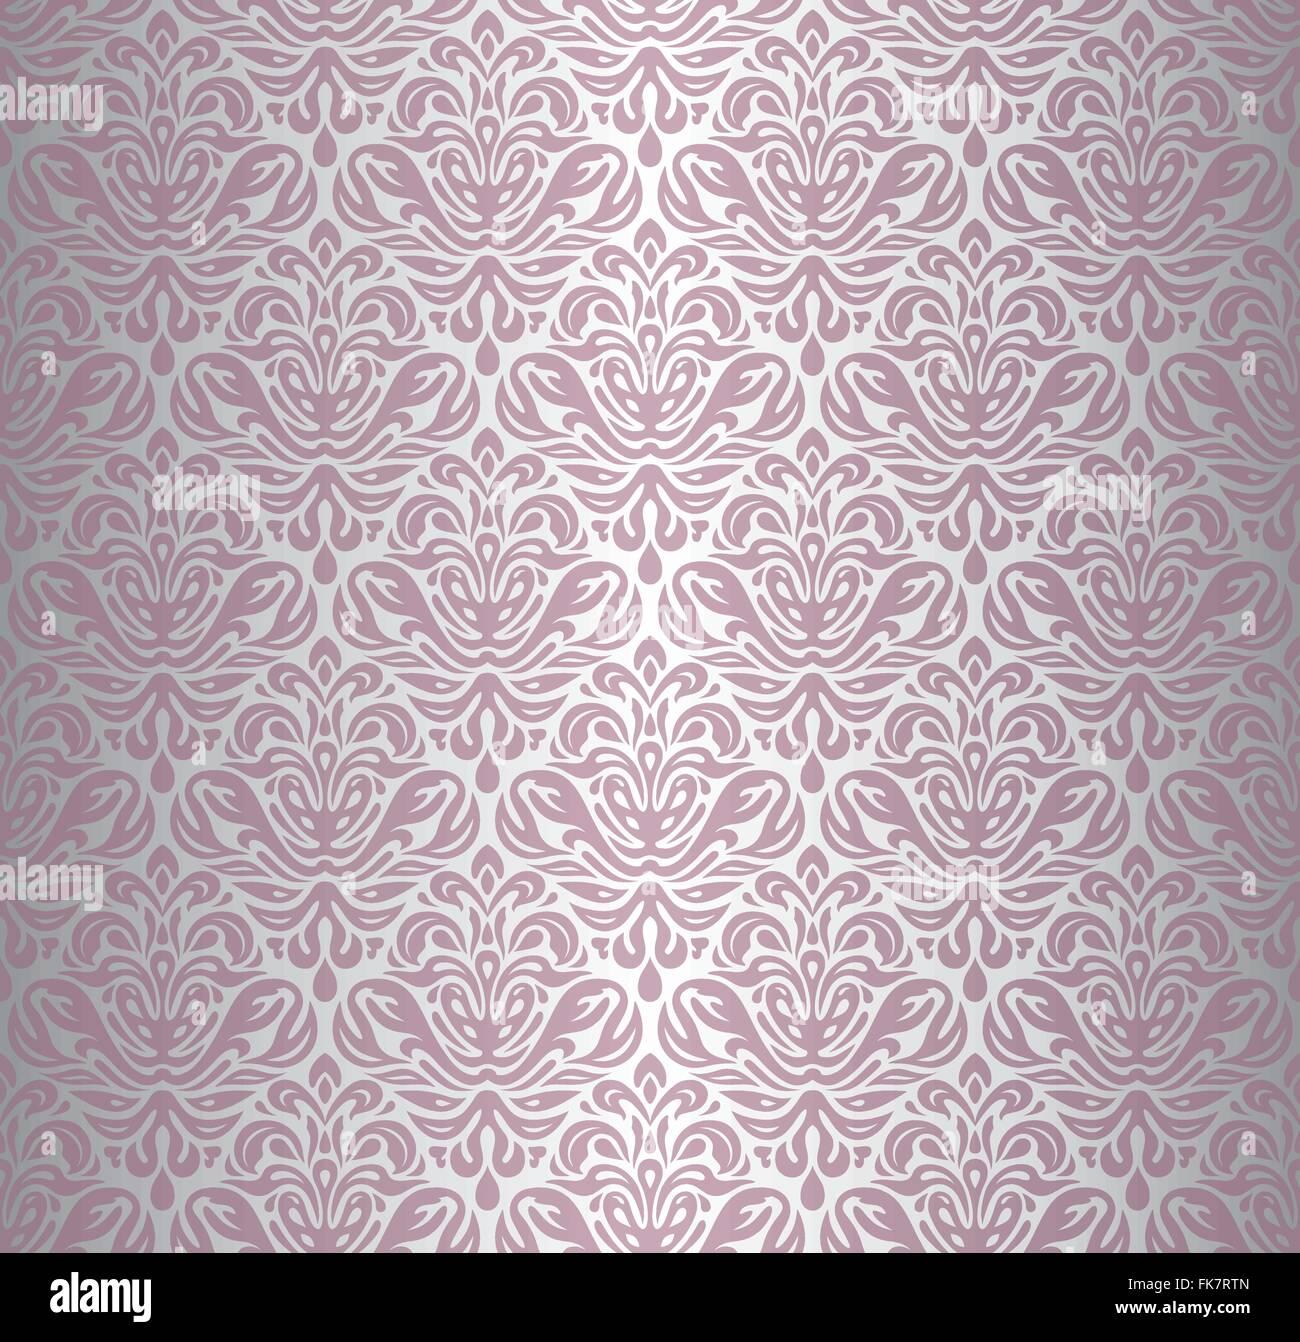 Berühmt Rosa & Silber Renaissance Muster dekorative Vintage Tapete Vektor MZ49